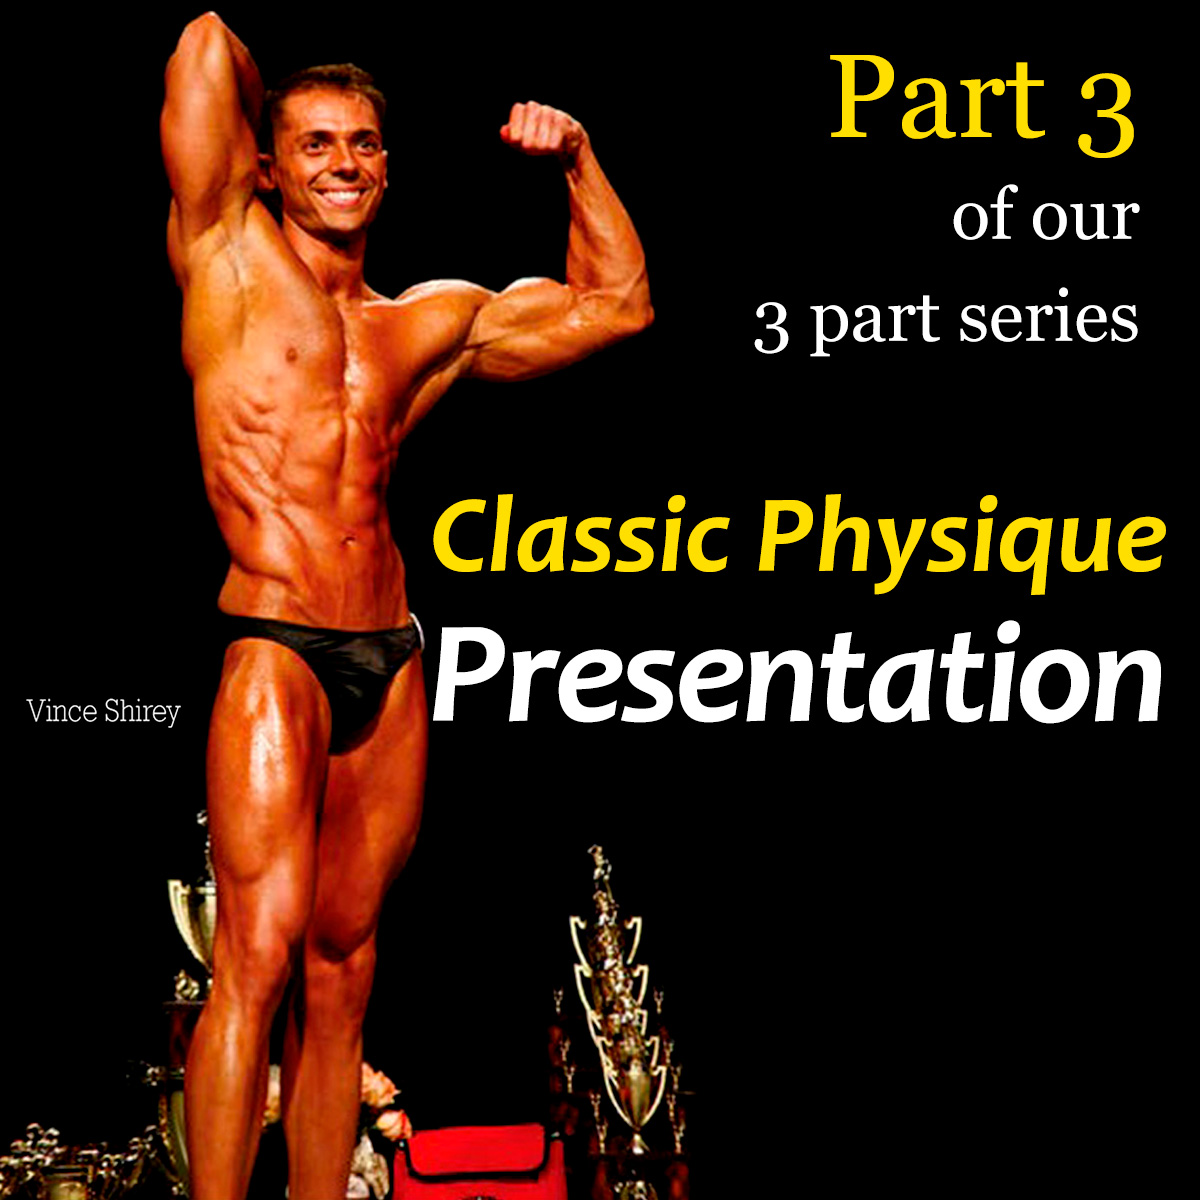 Classic Physique - Presentation